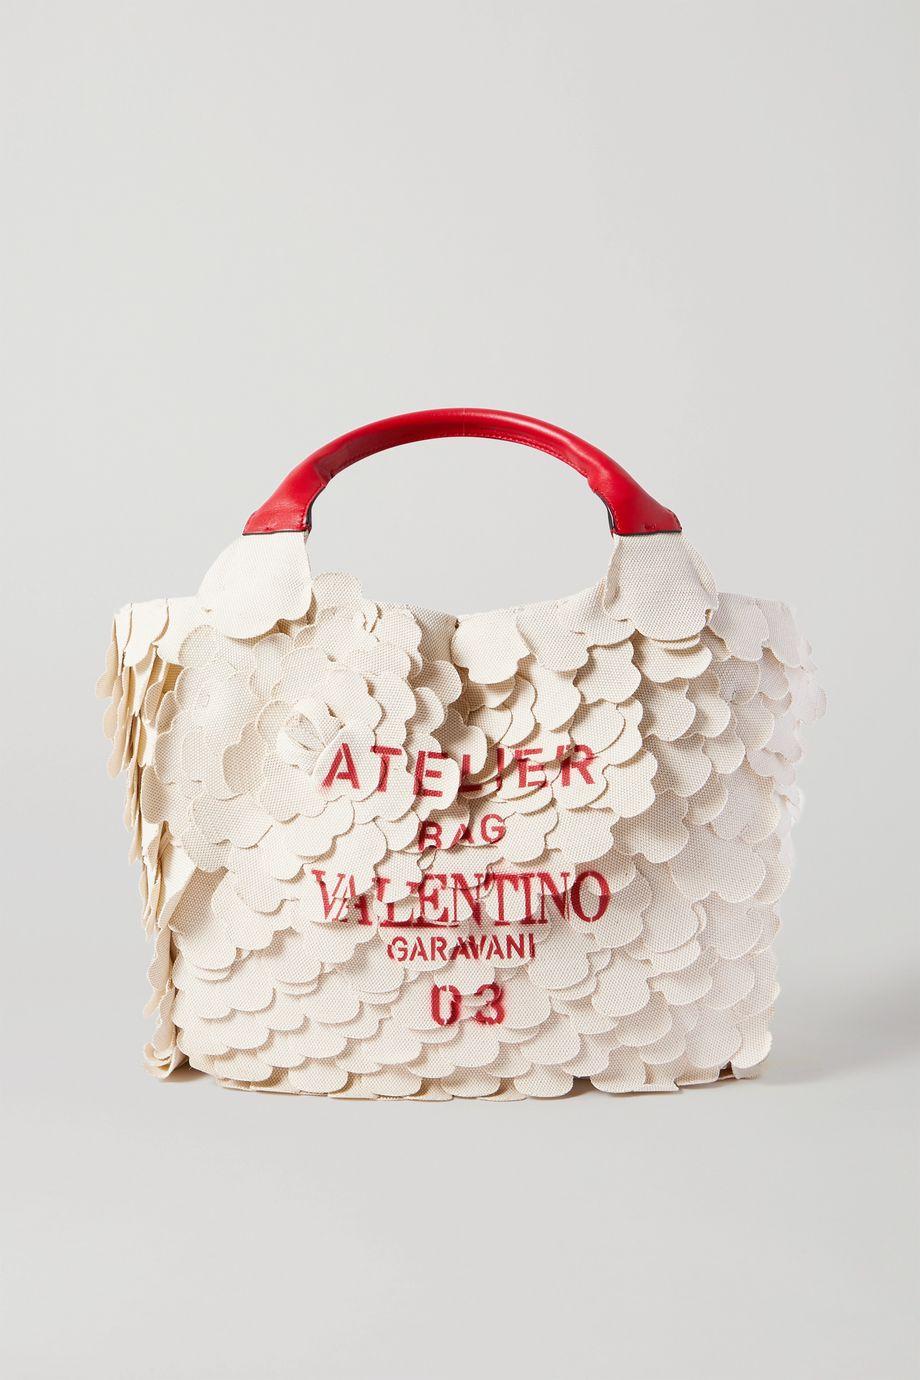 Valentino Sac à main en toile imprimée 03 Rose Edition Atelier Small Valentino Garavani